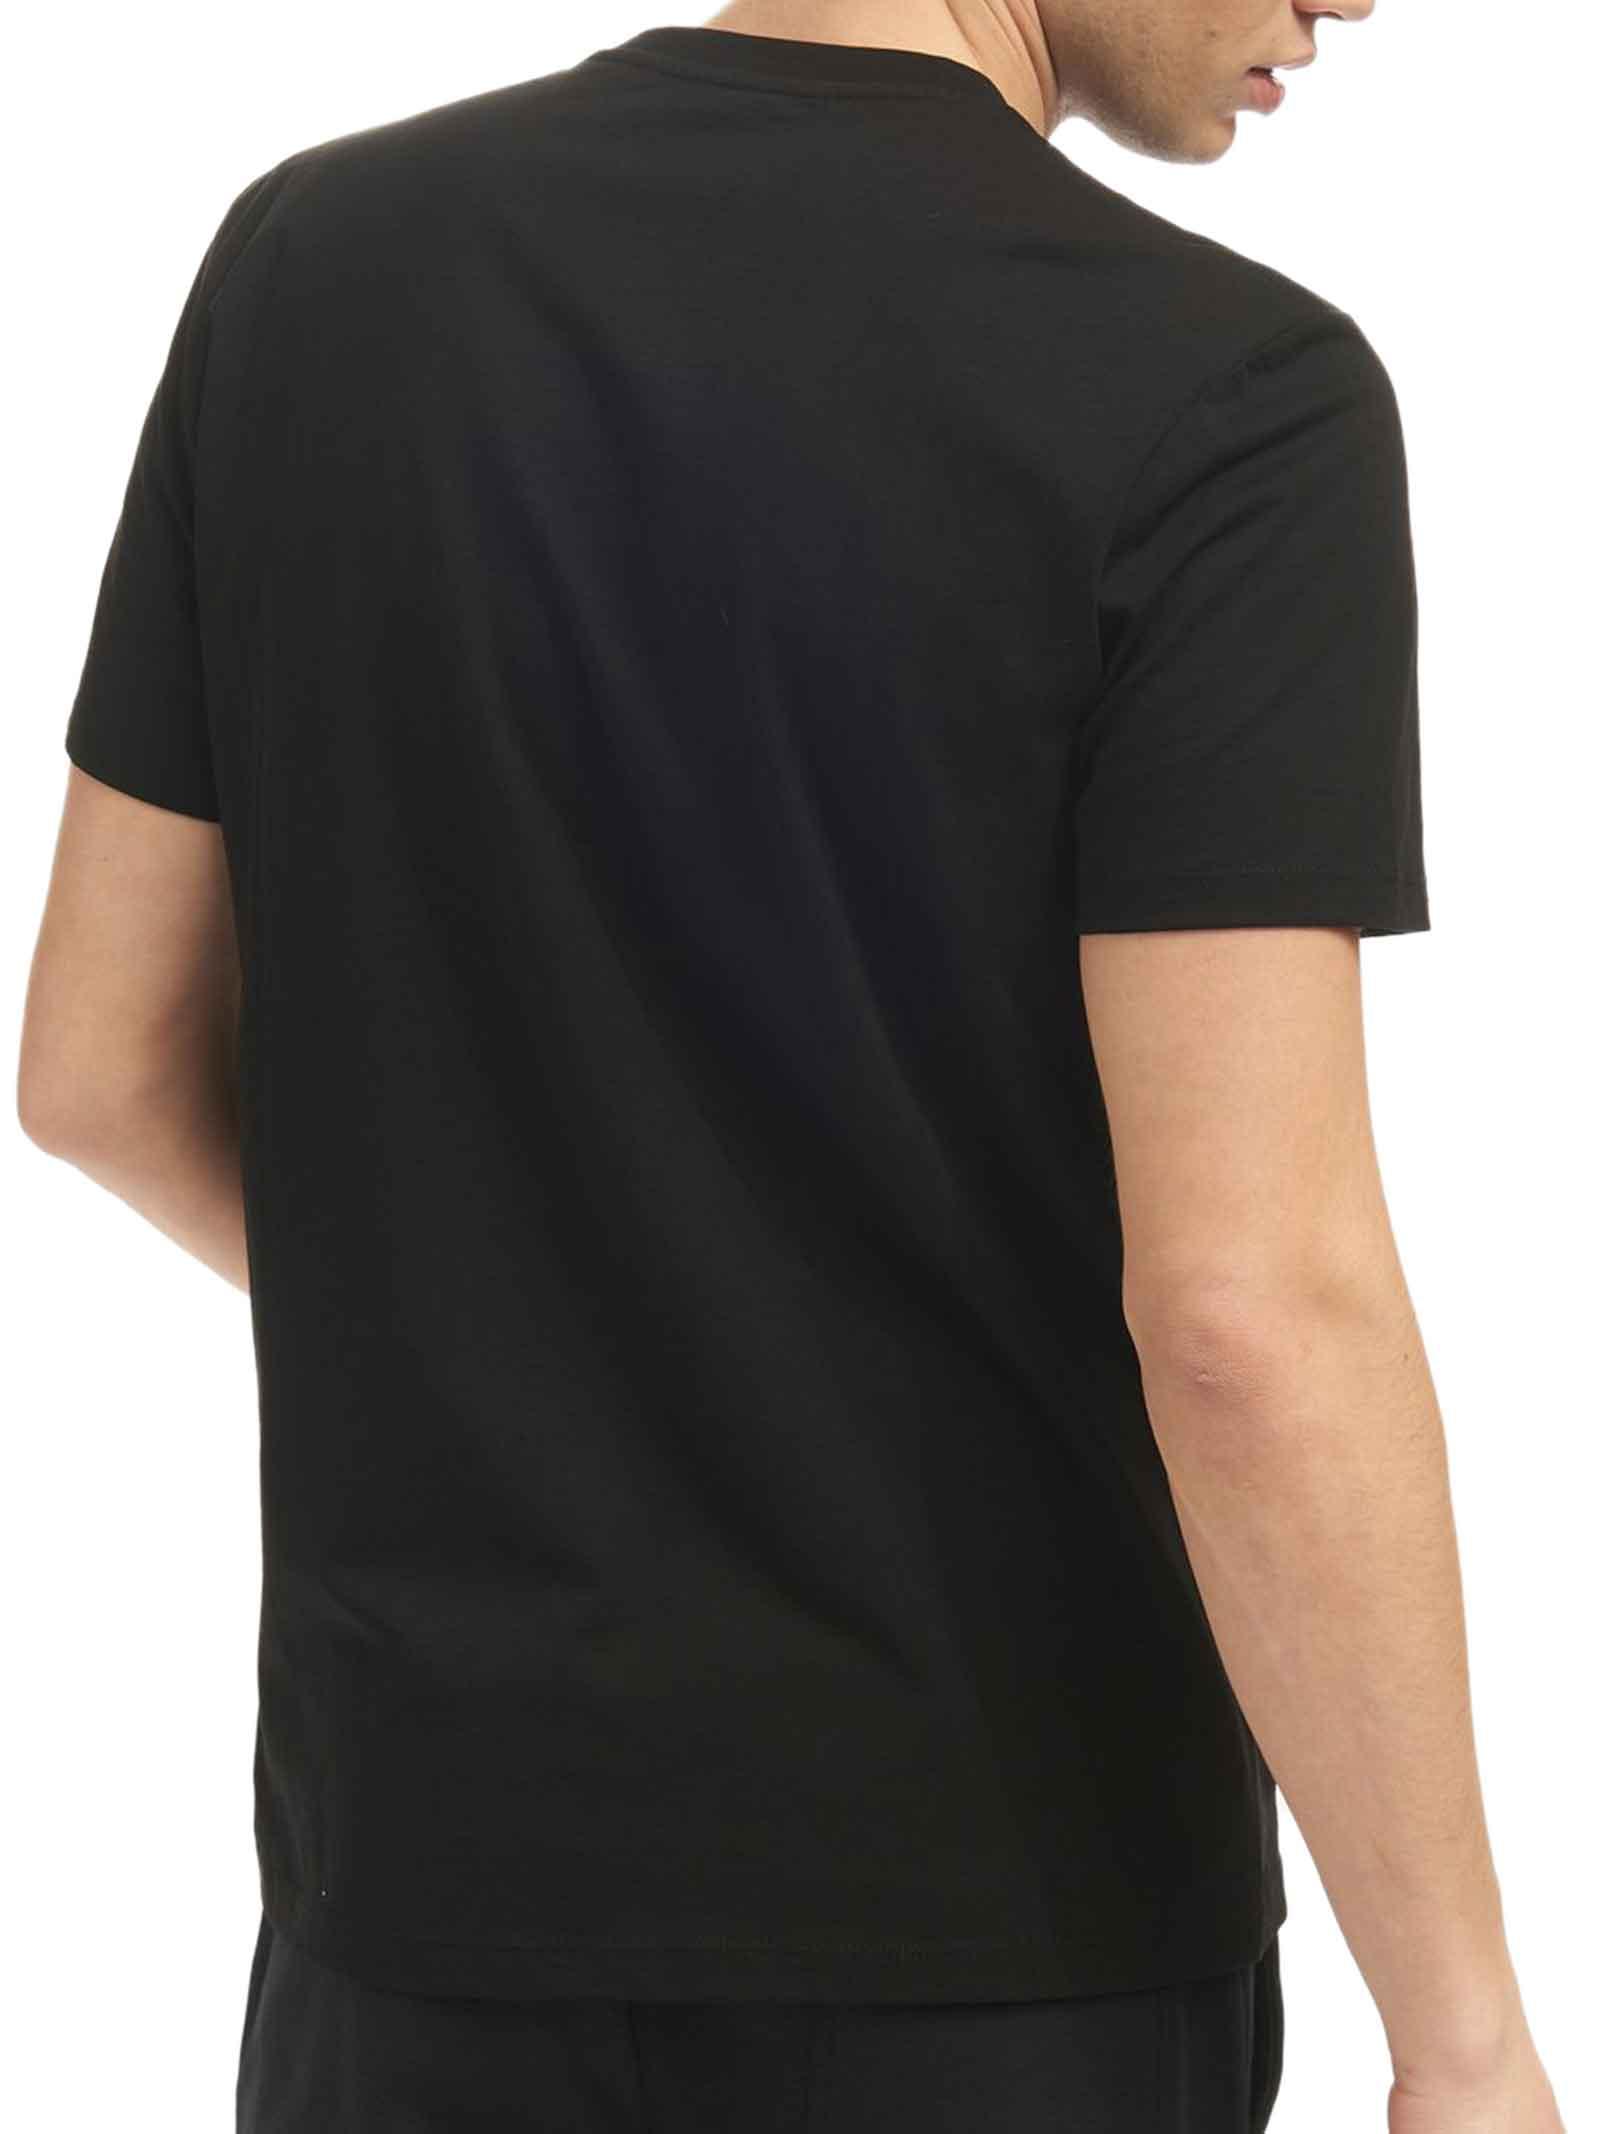 T-SHIRT UOMO BLAUER | T-shirt | 21SBLUH02133-004547999